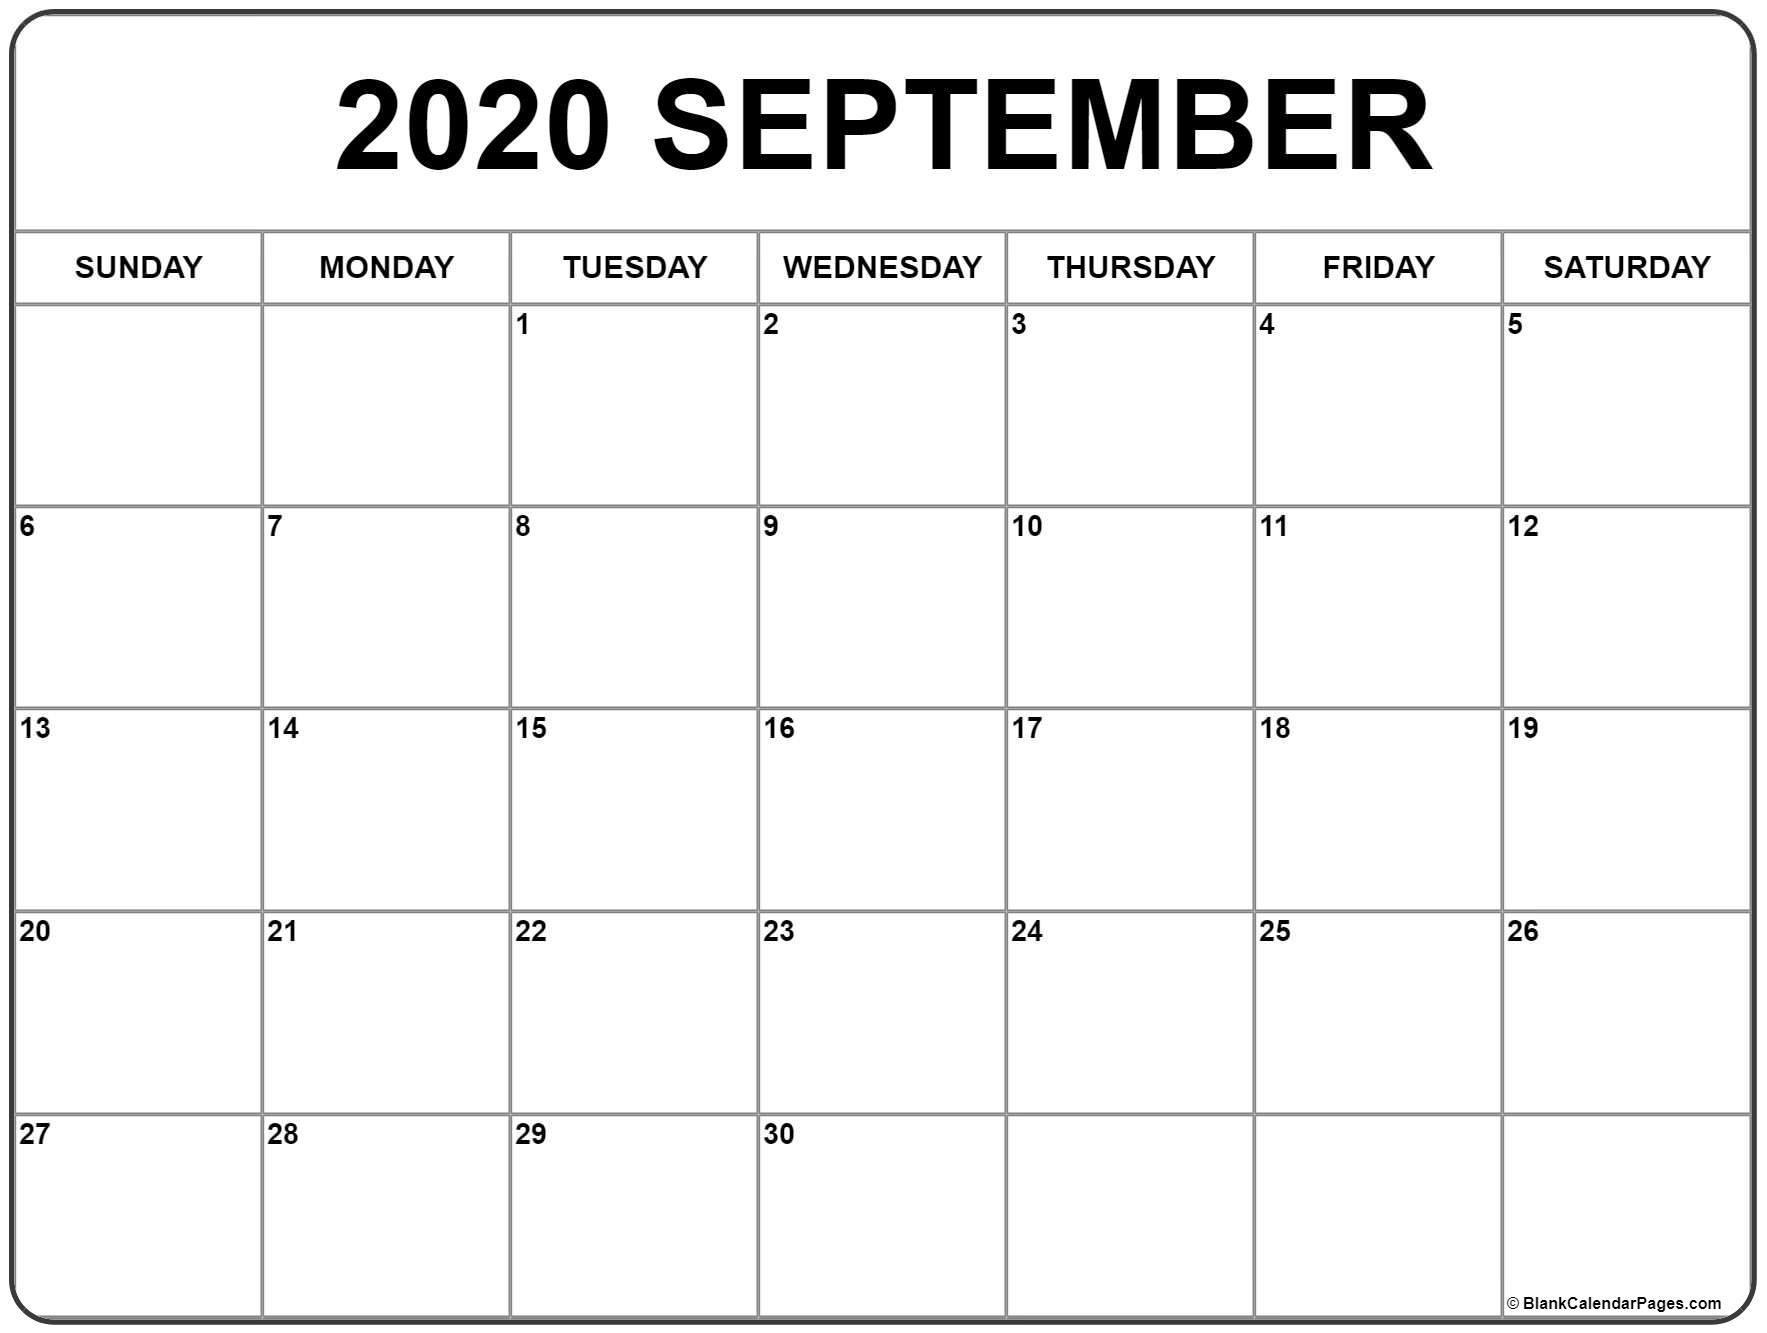 September 2020 Calendar | Free Printable Monthly Calendars  Blank September Calendar 2020 Monday Through Sunday